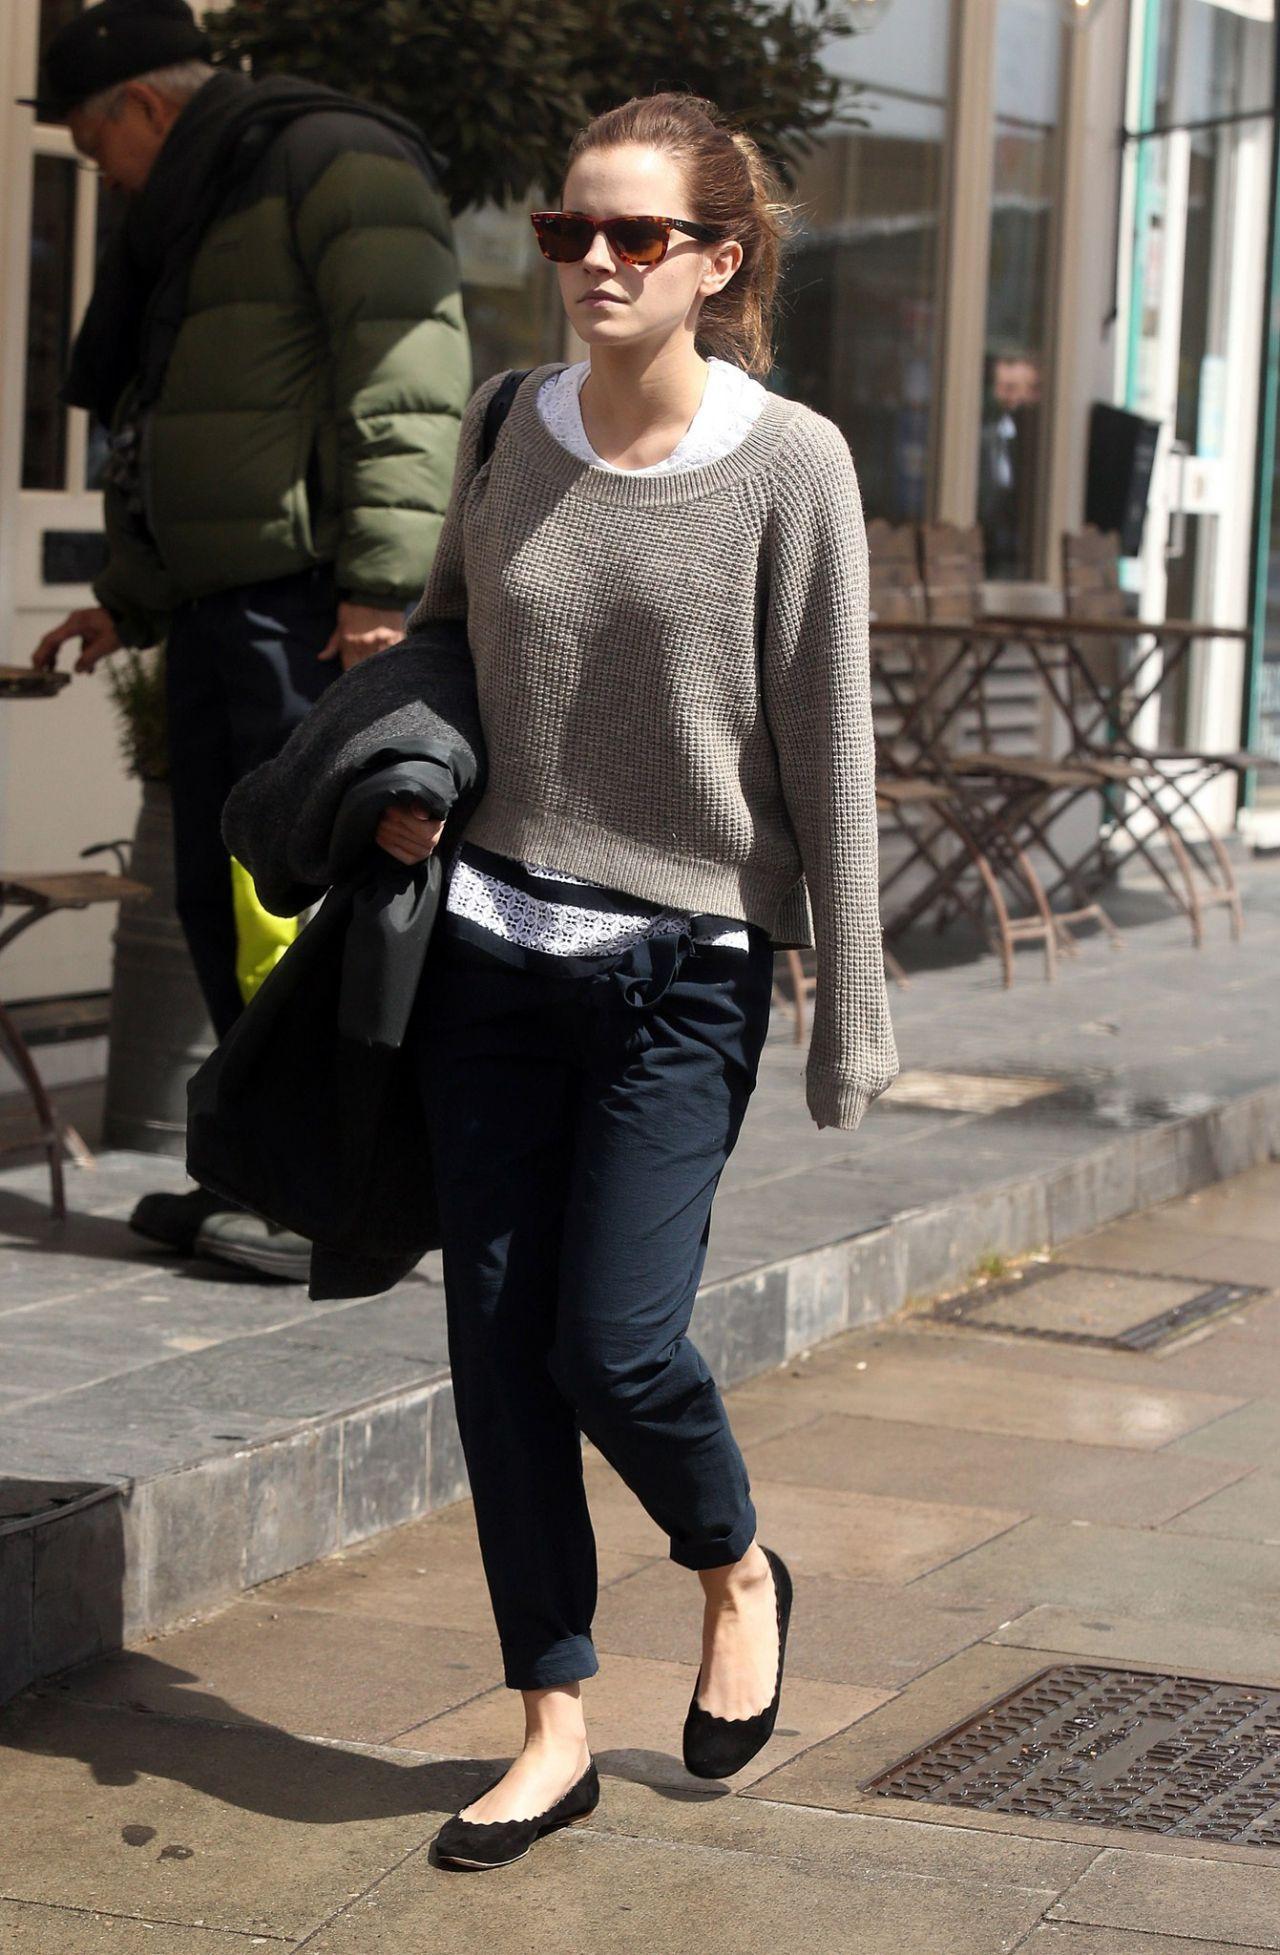 emma watson out in london may 2015 | emma watson privat